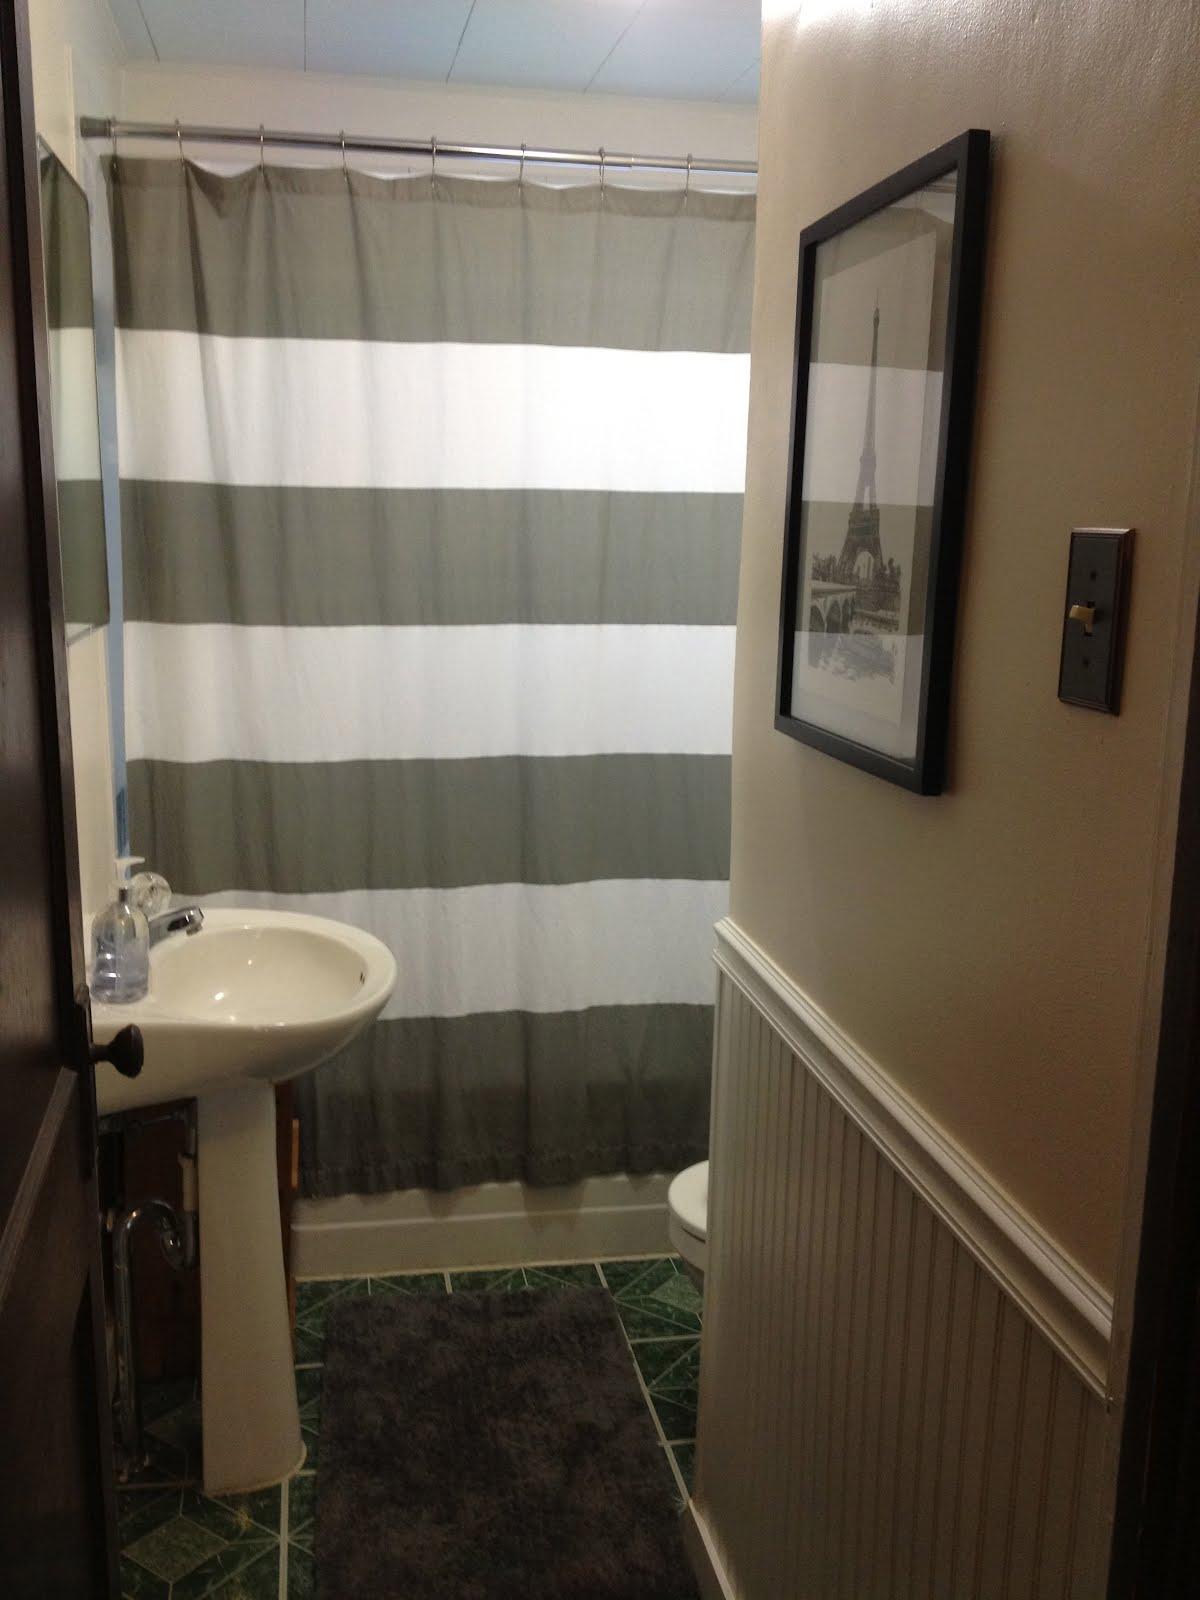 brooks bathroom design blog real that kuhar really alabama projects hall al estate birmingham pay milivoj remodeling off unsplash